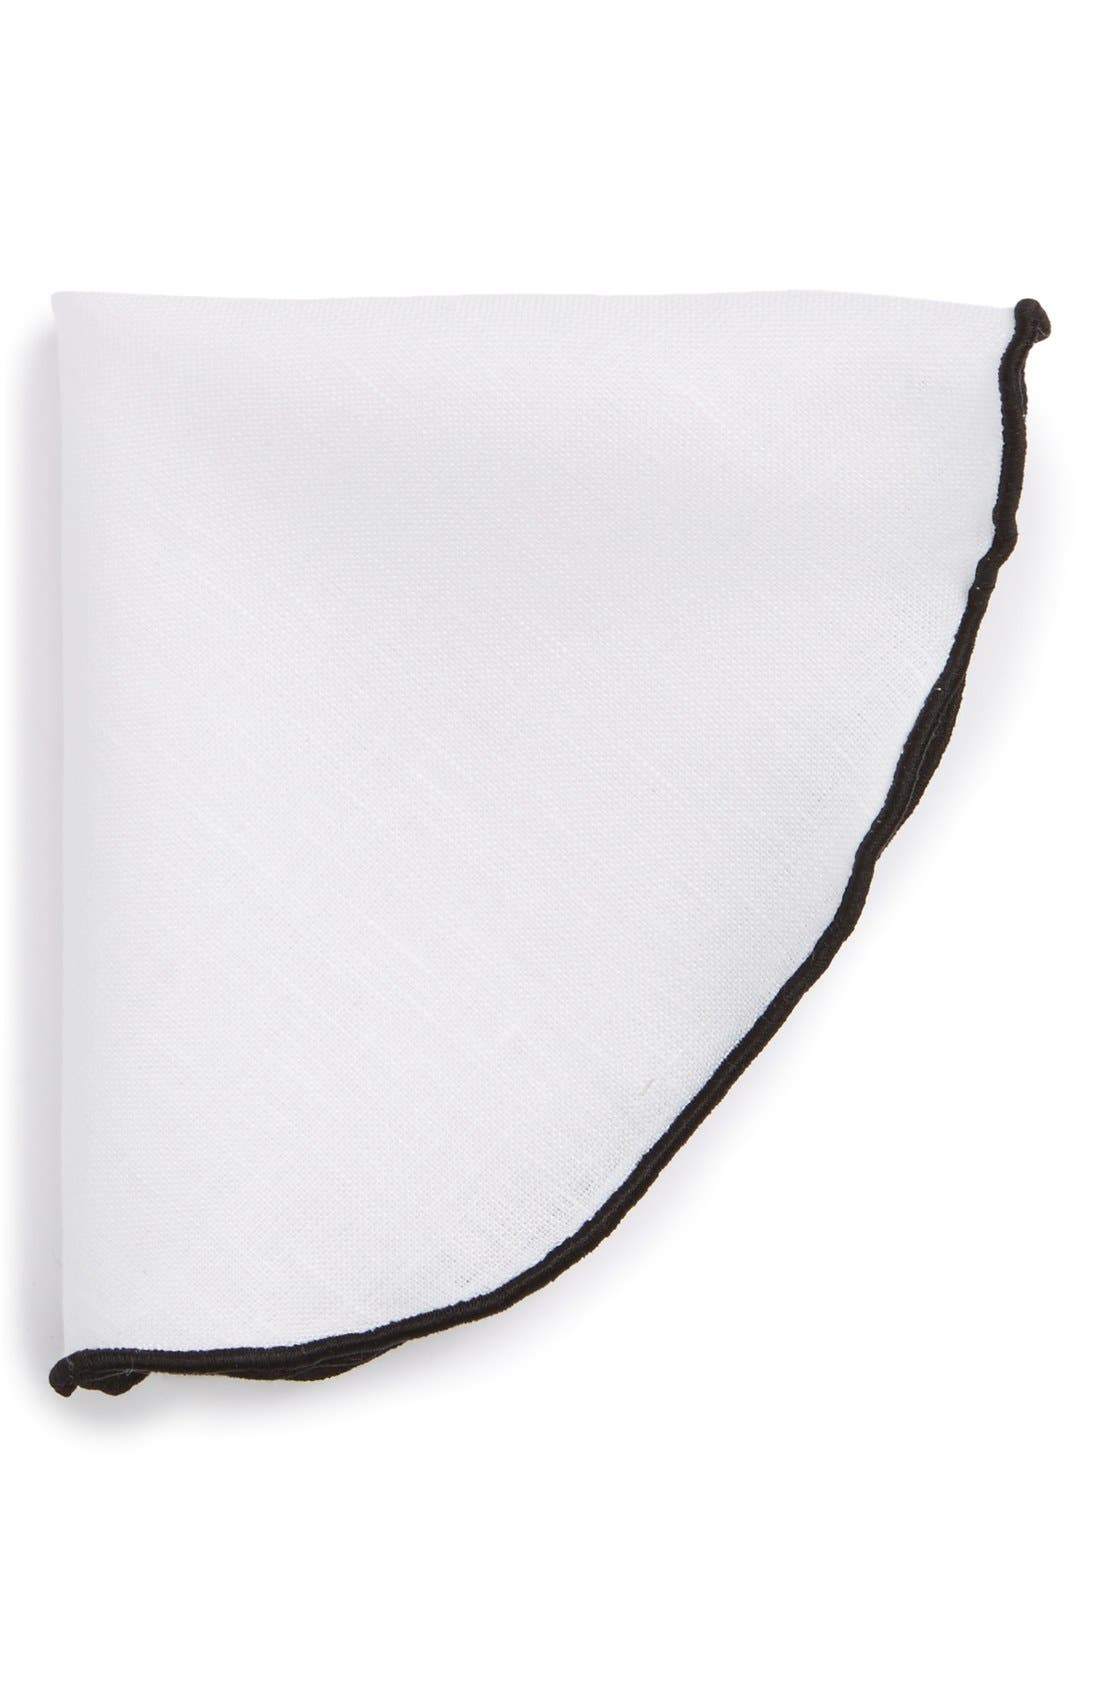 Linen Pocket Round,                             Main thumbnail 1, color,                             White/ Black Trim